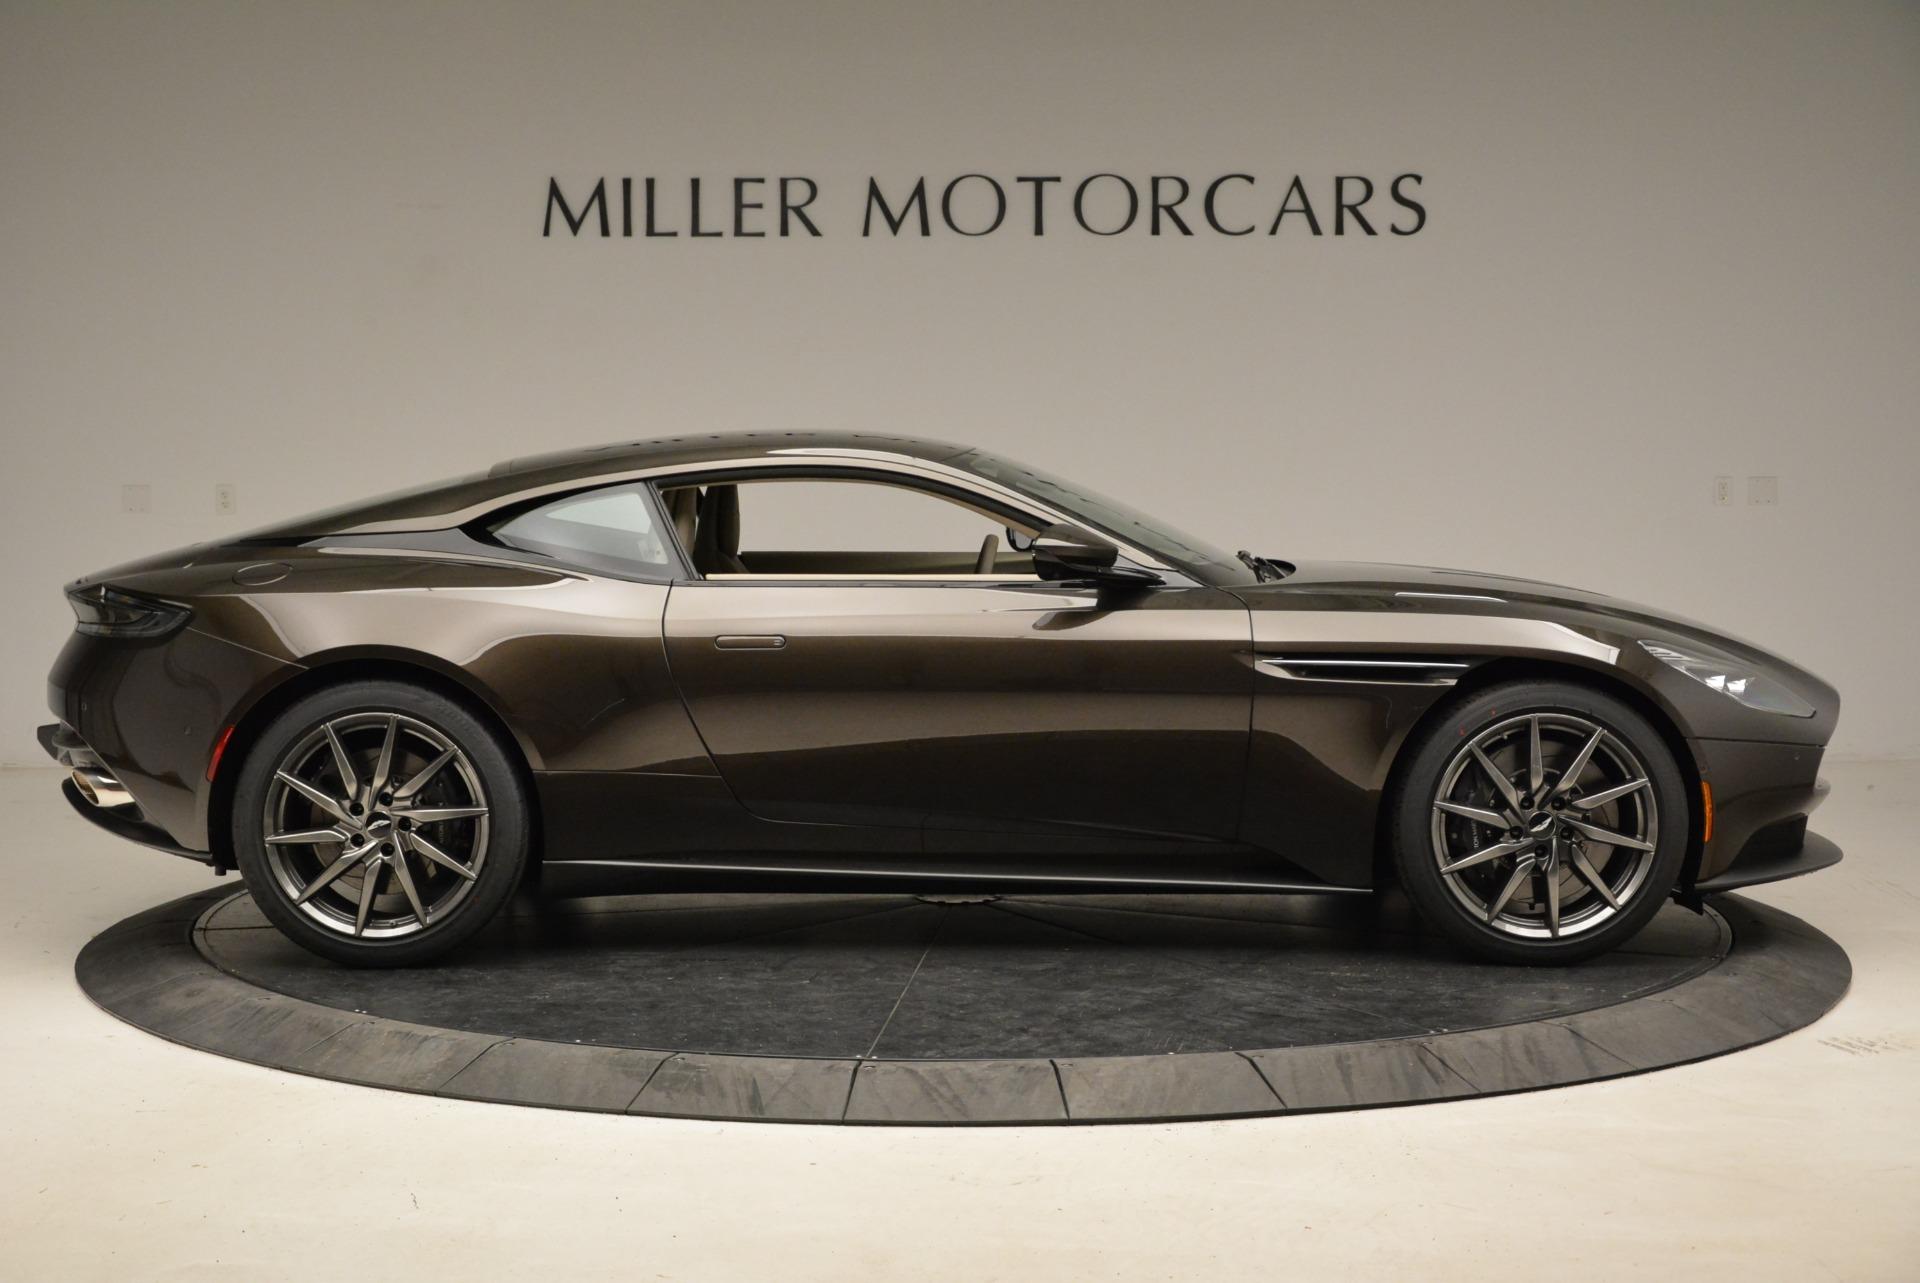 New 2018 Aston Martin DB11 V12 For Sale In Greenwich, CT 1904_p9